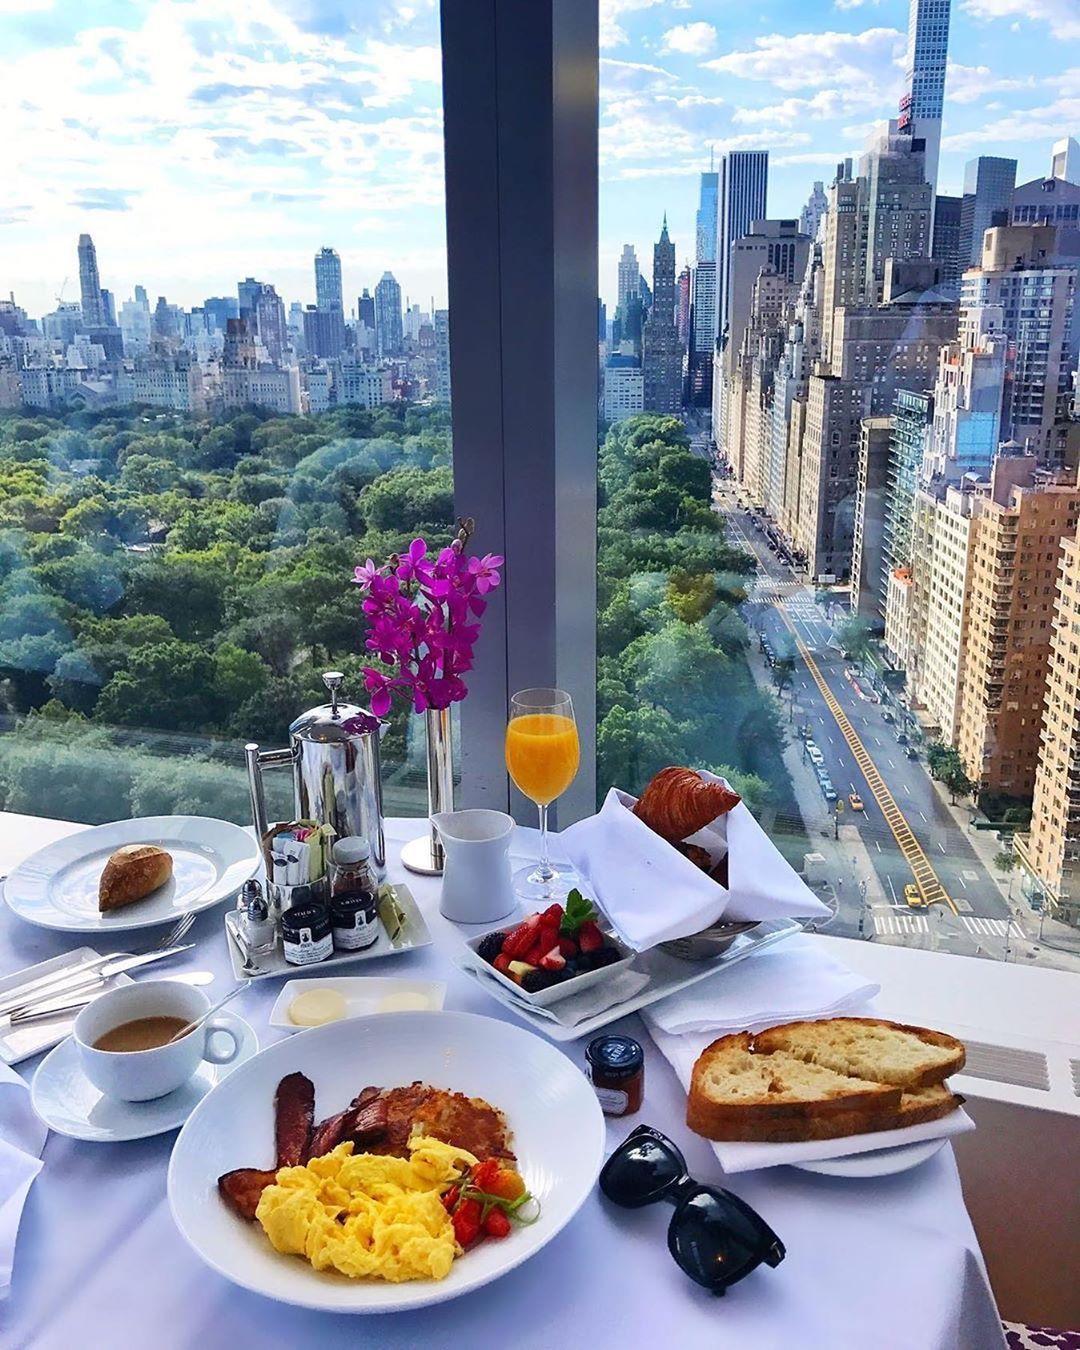 Te Imaginas Un Desayuno Con Vista Al Central Park In 2020 Breakfast Around The World New York Food Hotel Breakfast Buffet